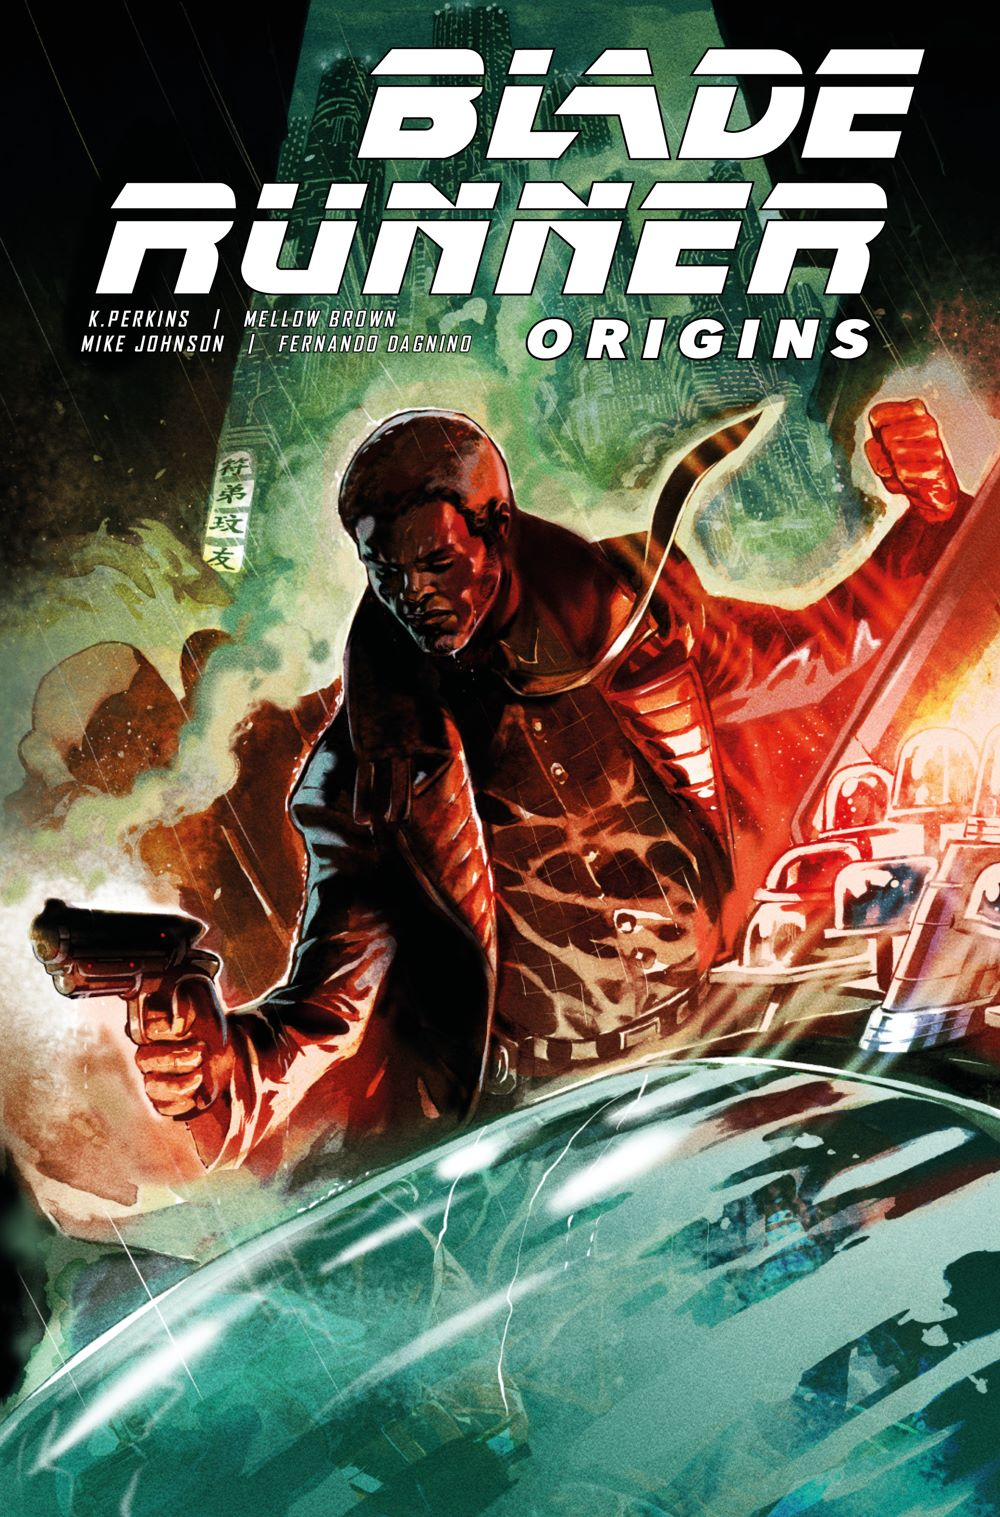 Blade-Runner-Origins-4C-DAGNINO Titan Comics May 2021 Solicitations